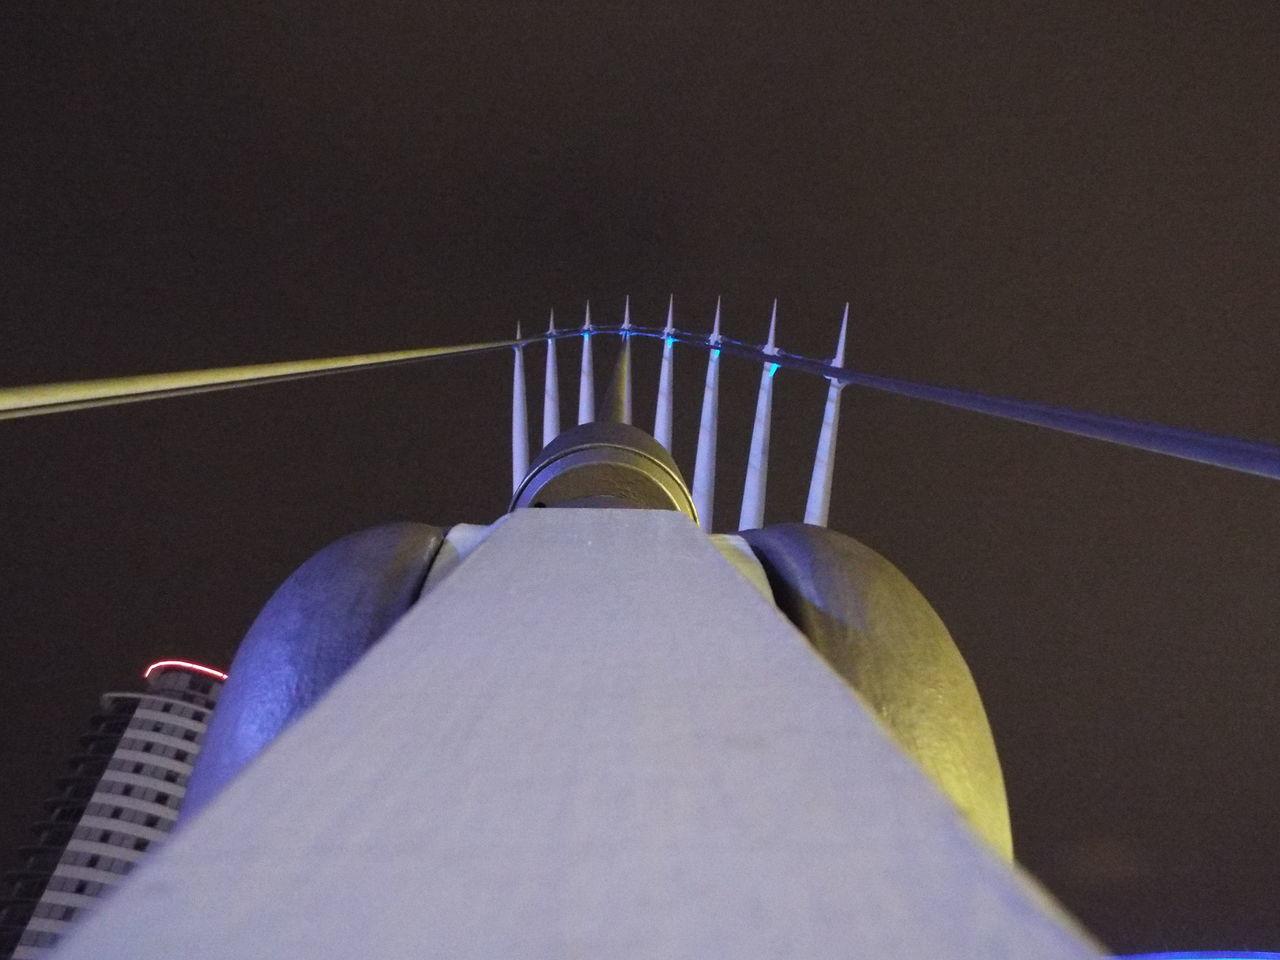 Media City UK footbridge cables and posts Night View Lighting Footbridge Swing Bridge Cable Bridge Bridge Media City Salford Salford Quays Salford United Kingdom Posts Cable